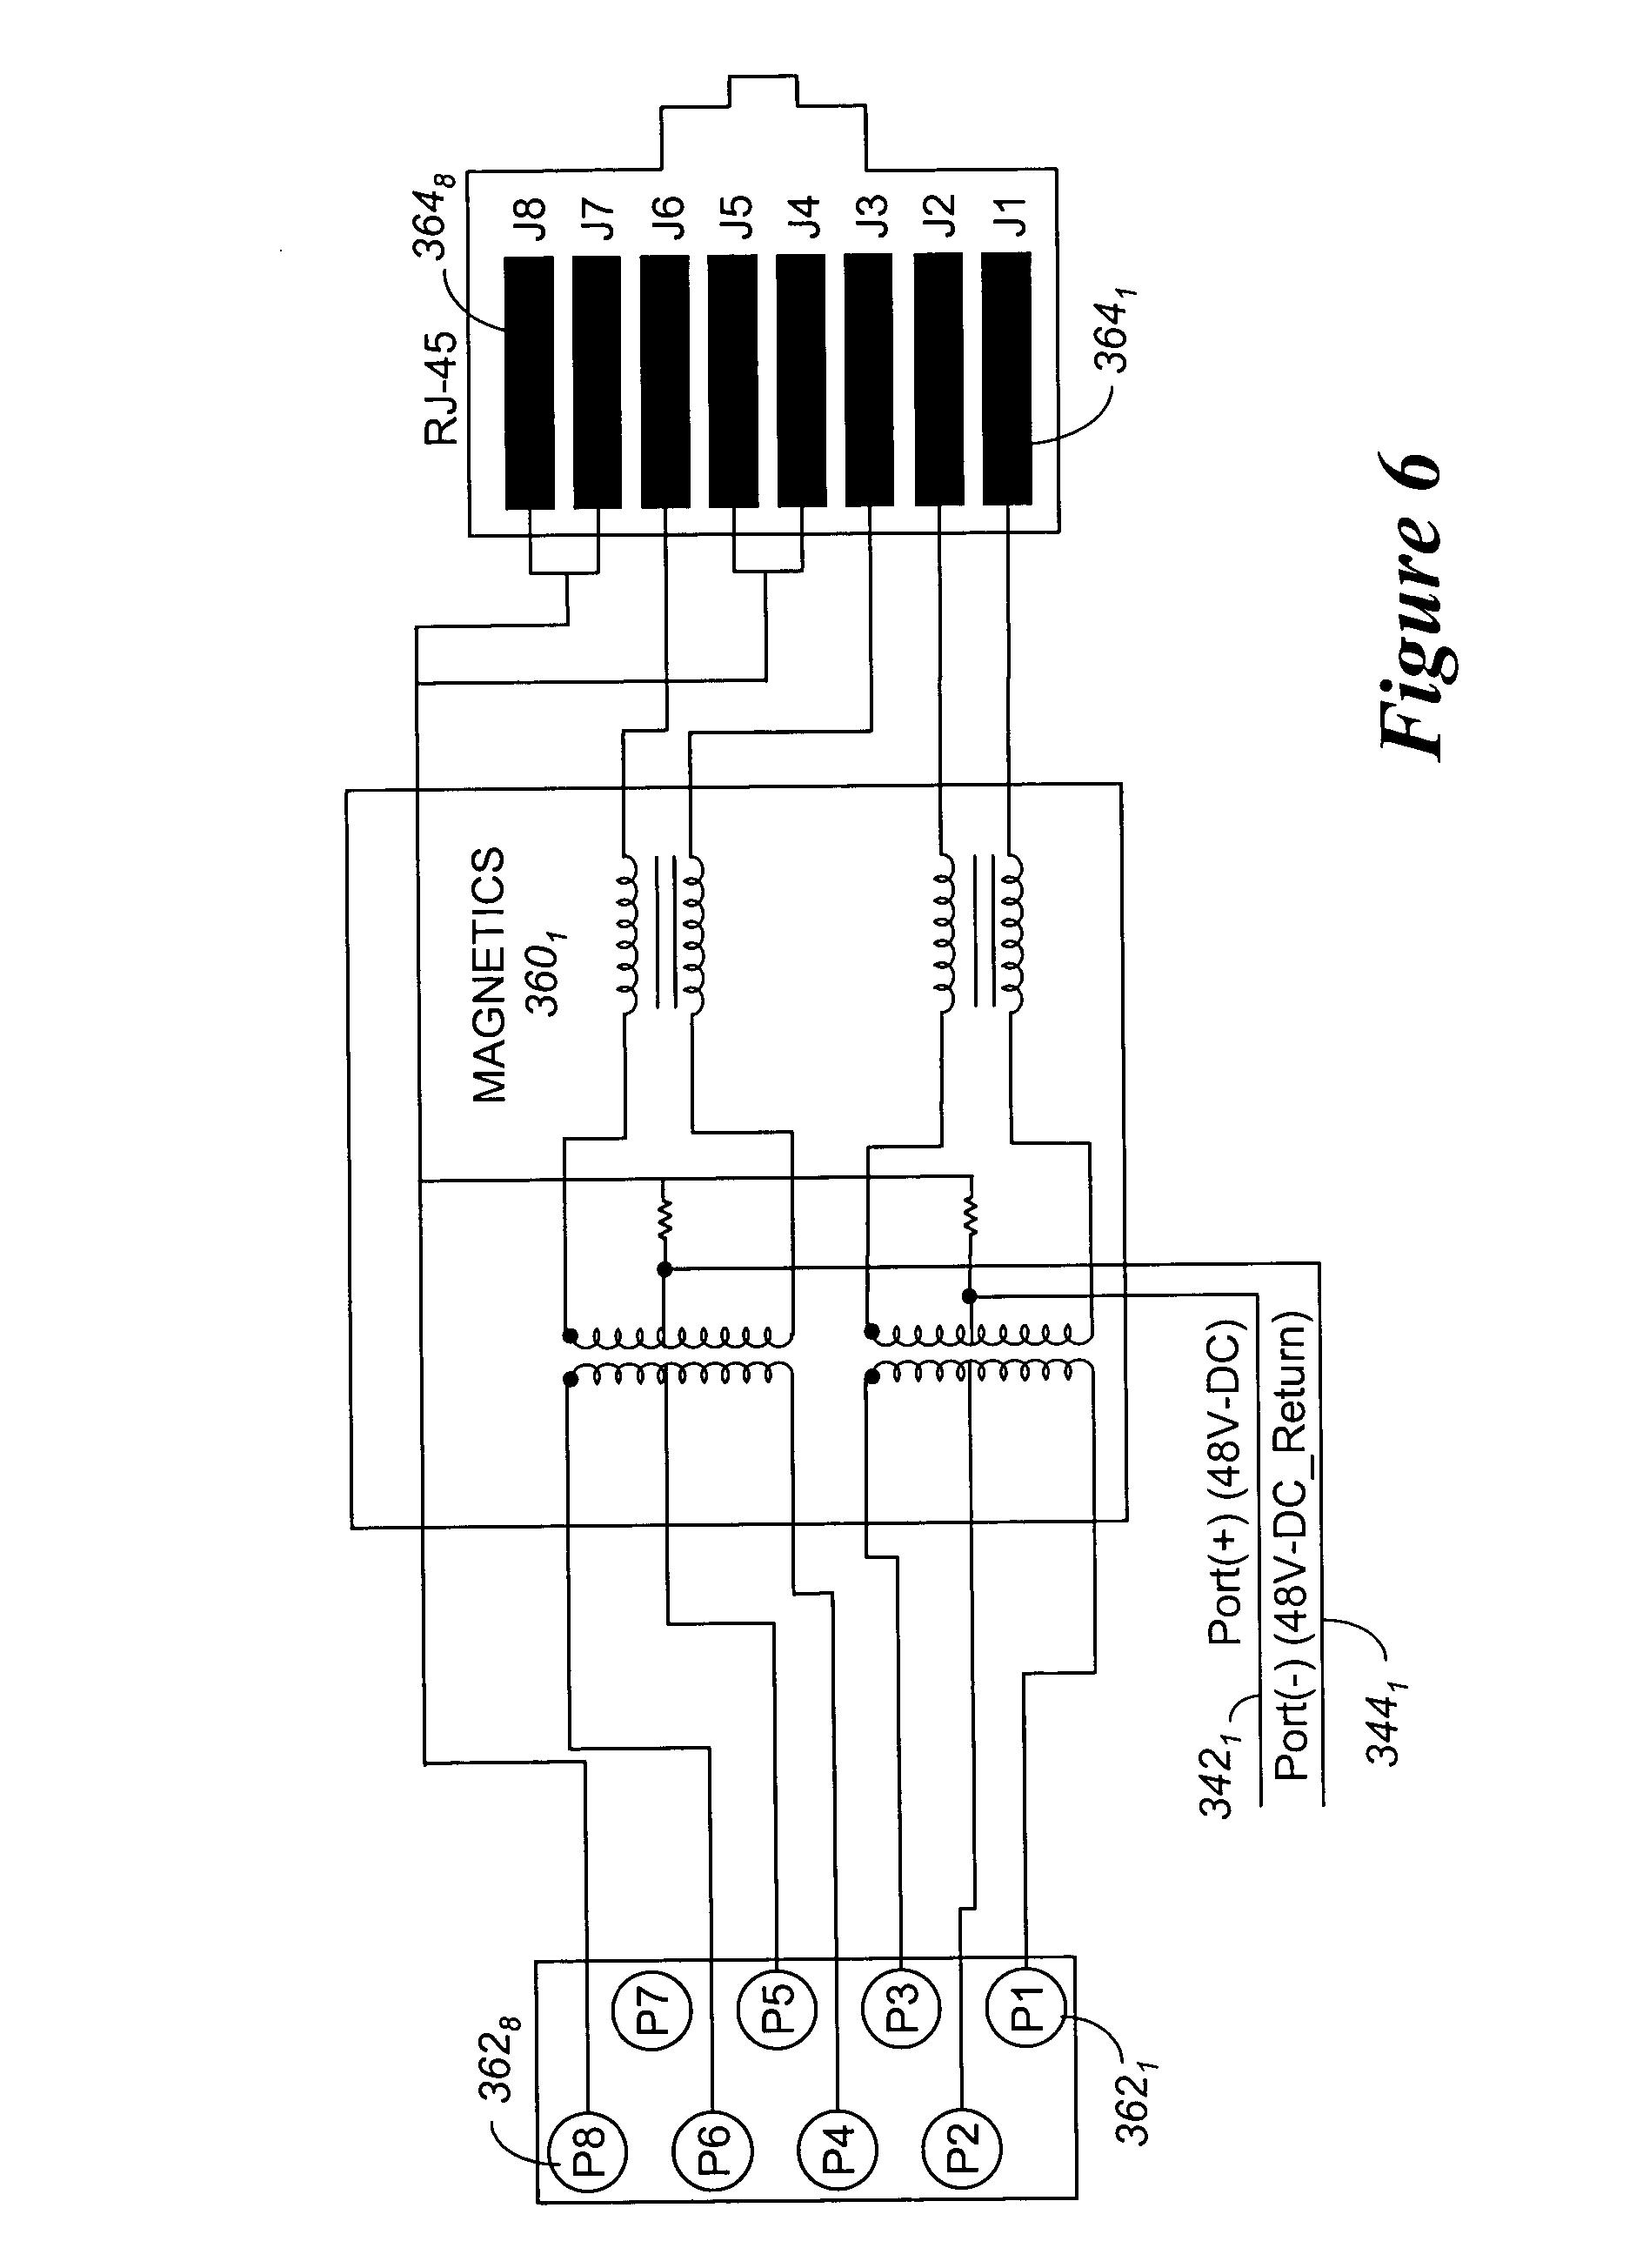 poe rj45 jack wiring diagram